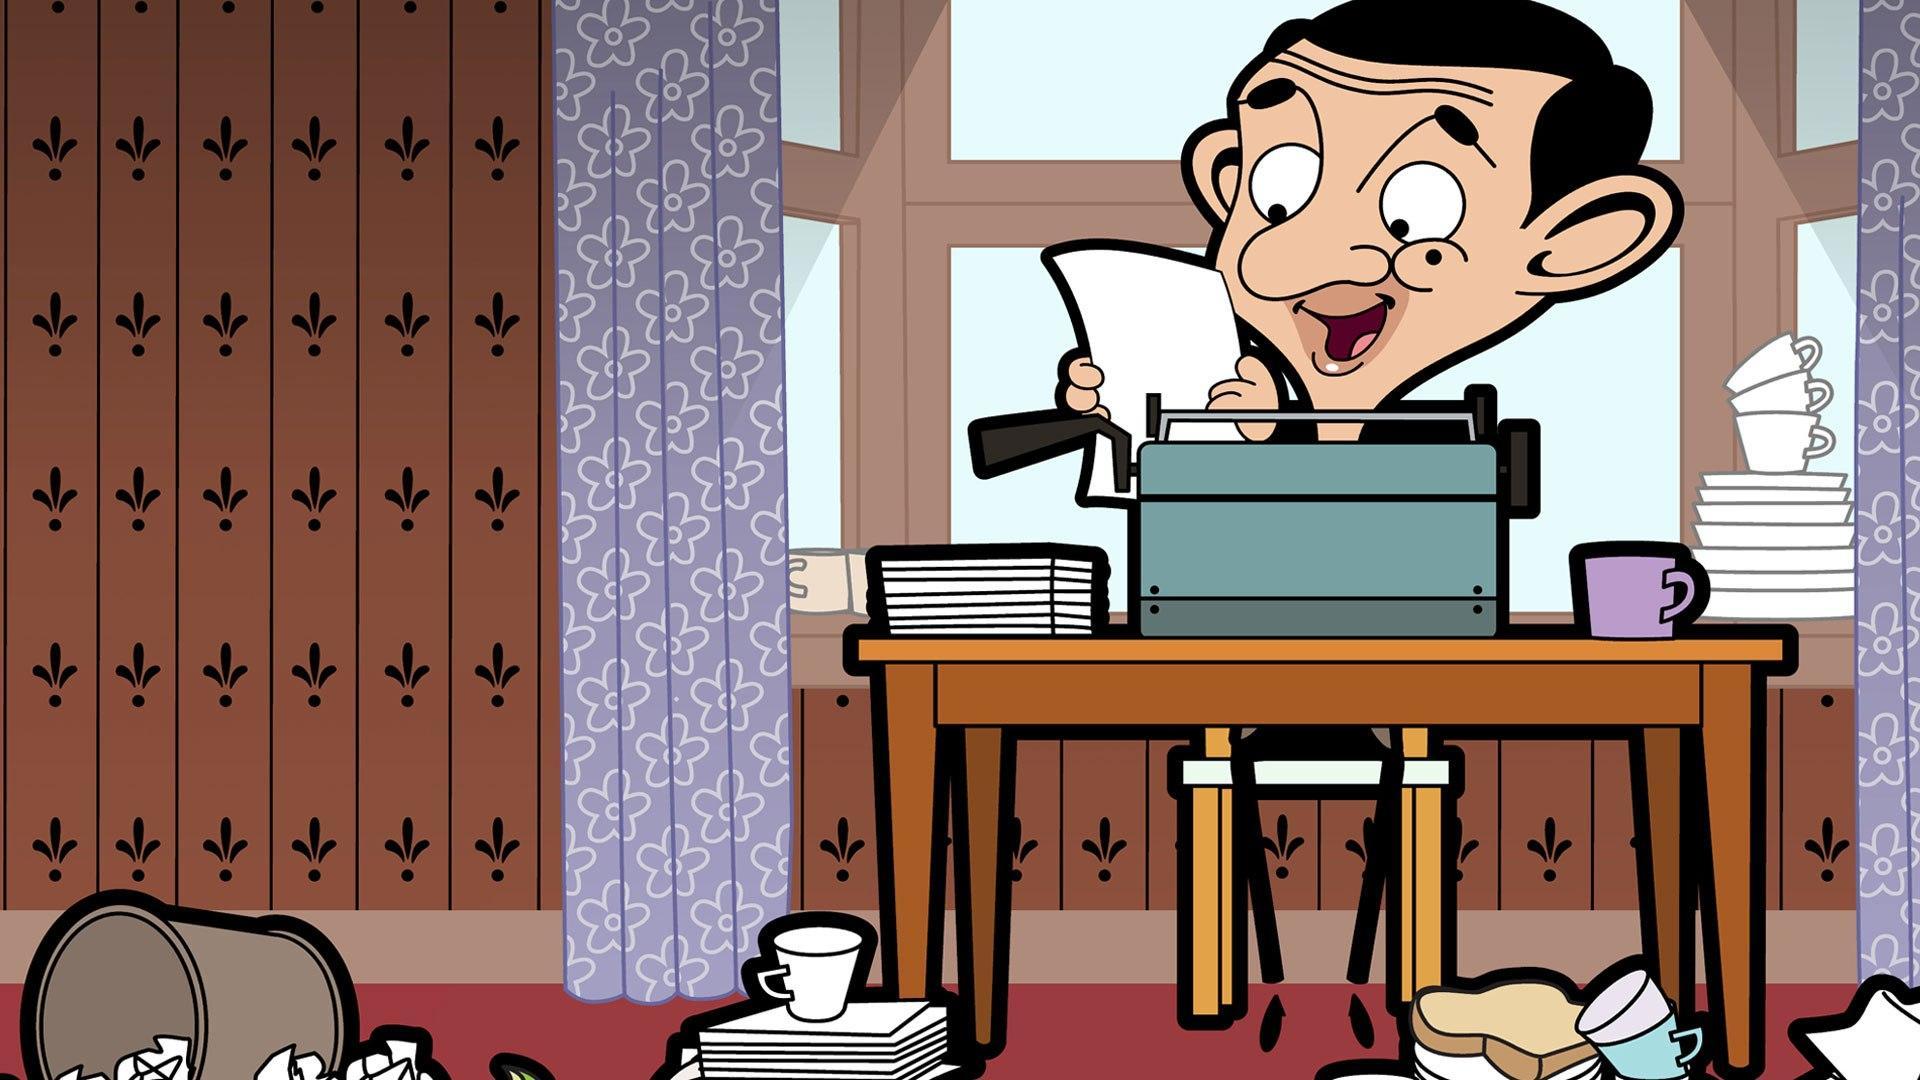 Boomerang The Mr. Bean Animated Series